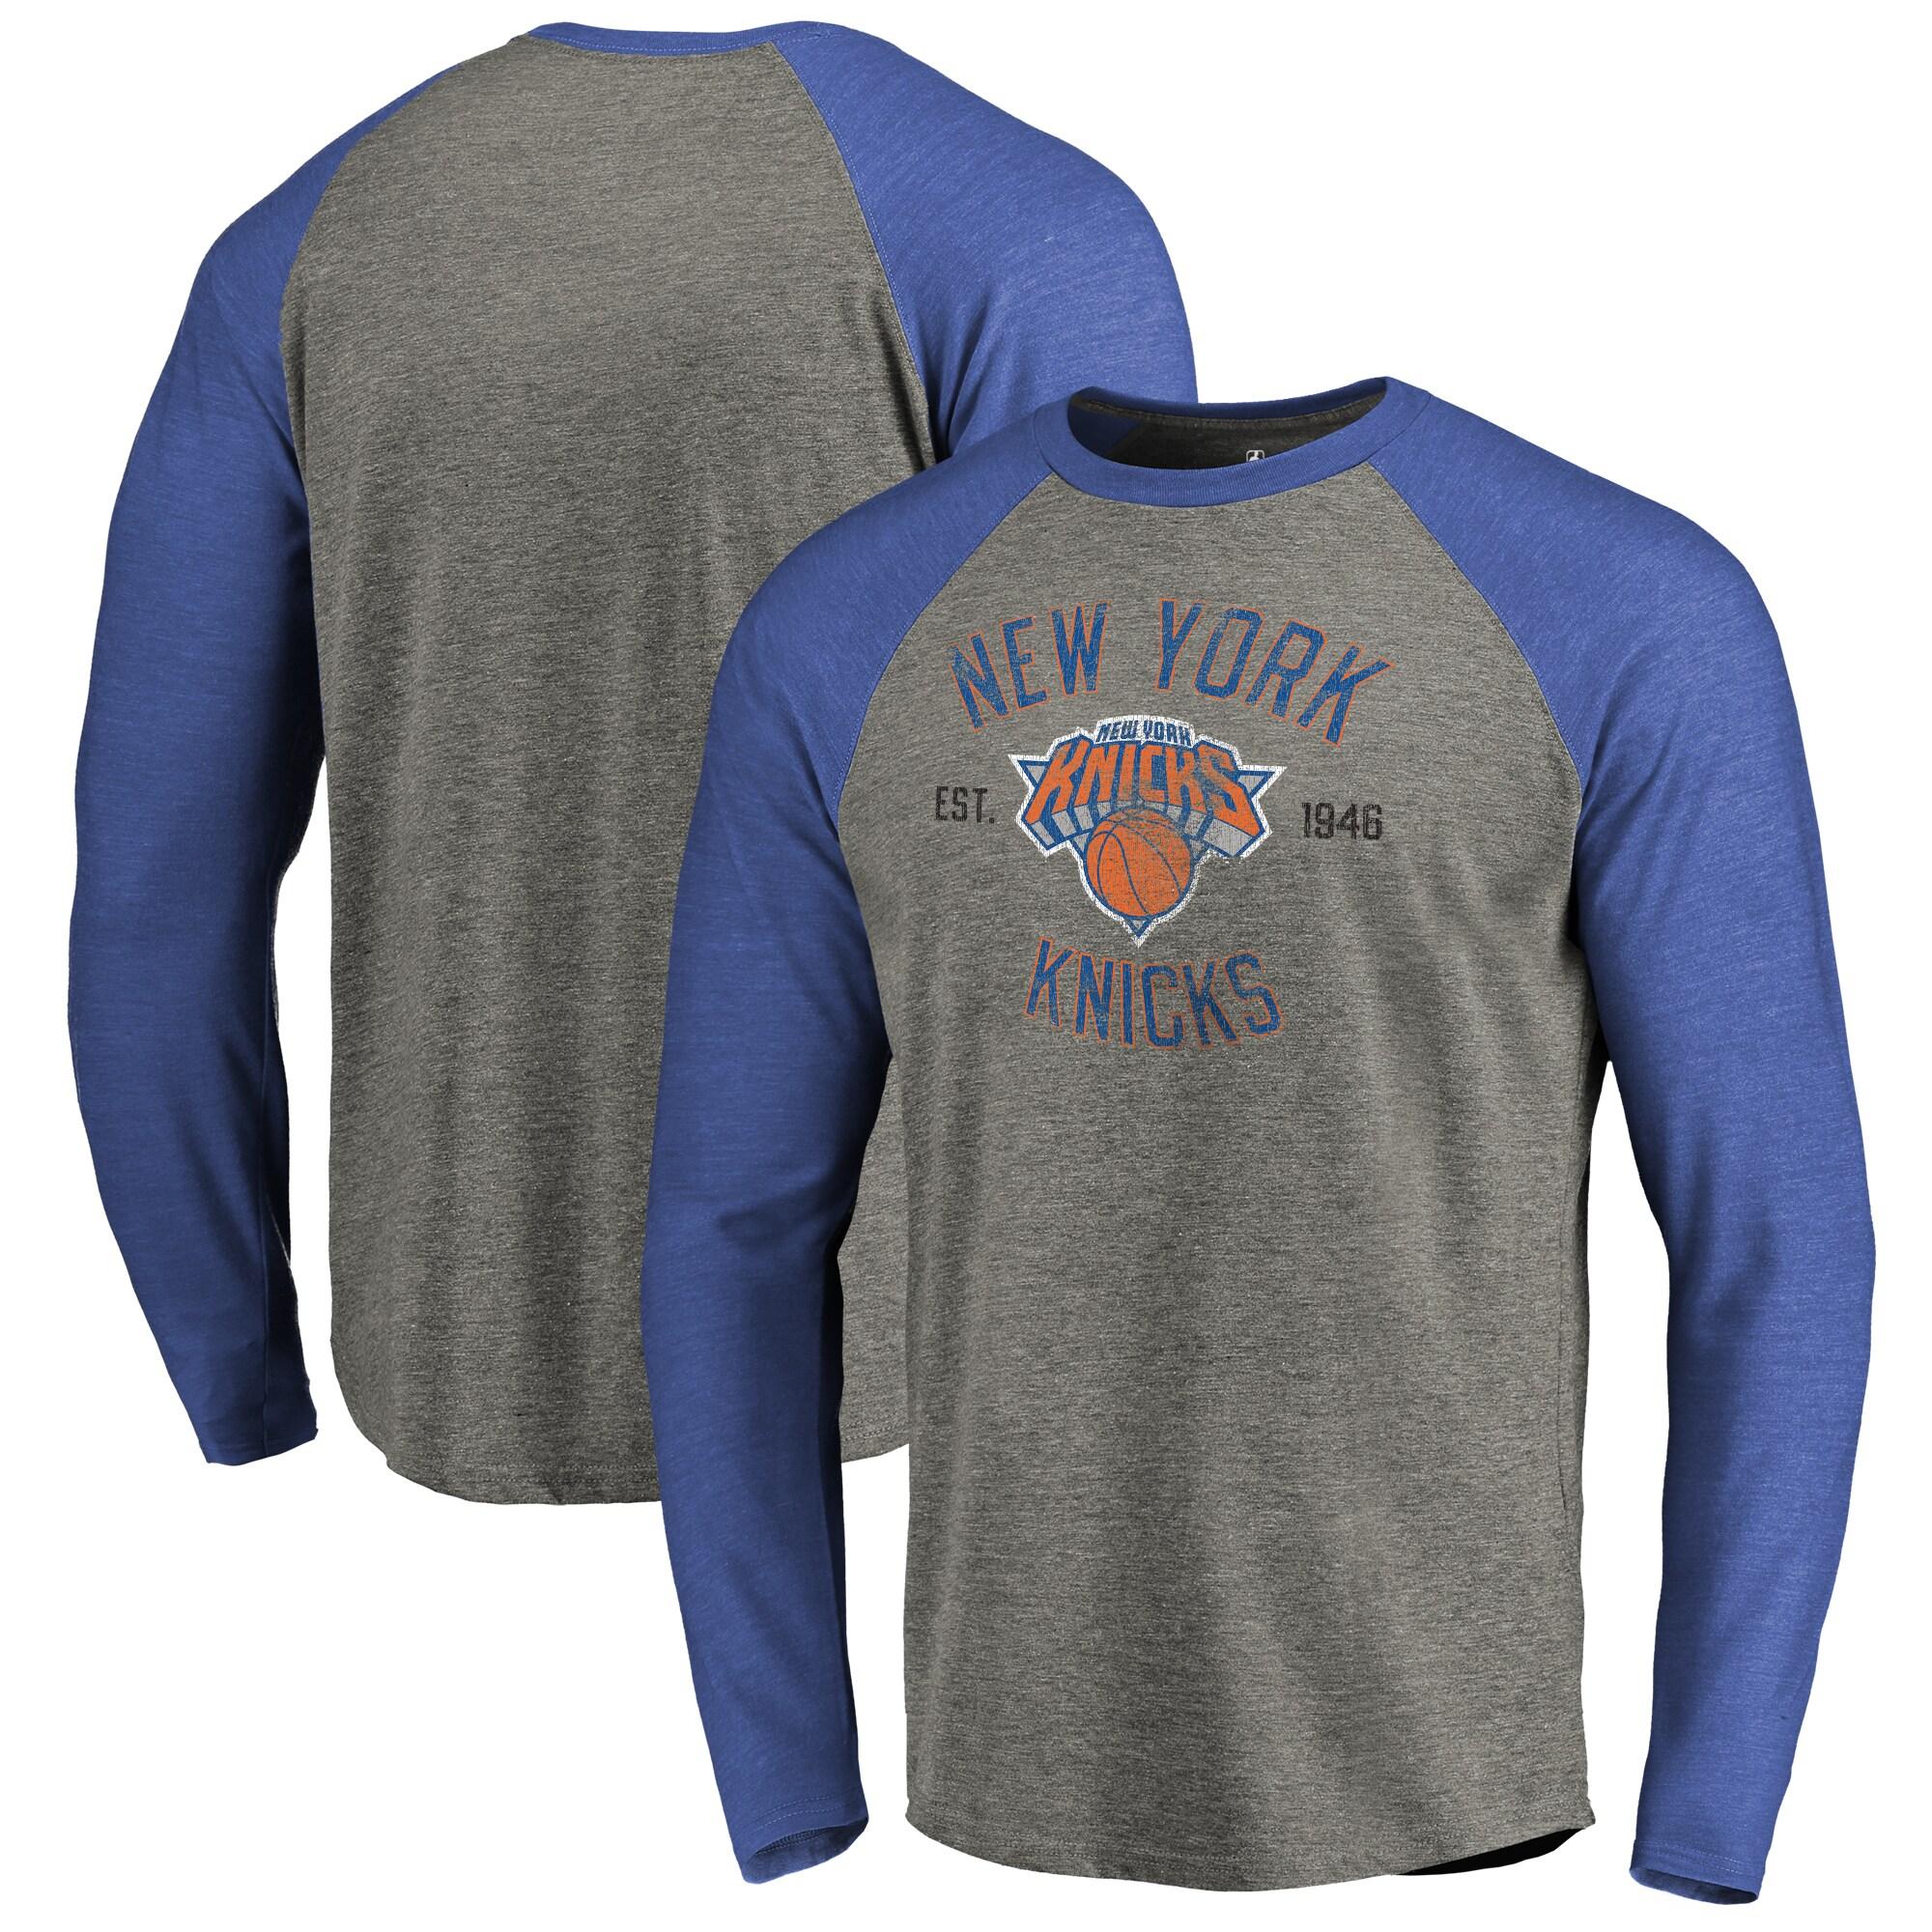 New York Knicks Fanatics Branded Heritage Big and Tall Long Sleeve Tri-Blend Raglan T-Shirt - Heathered Gray